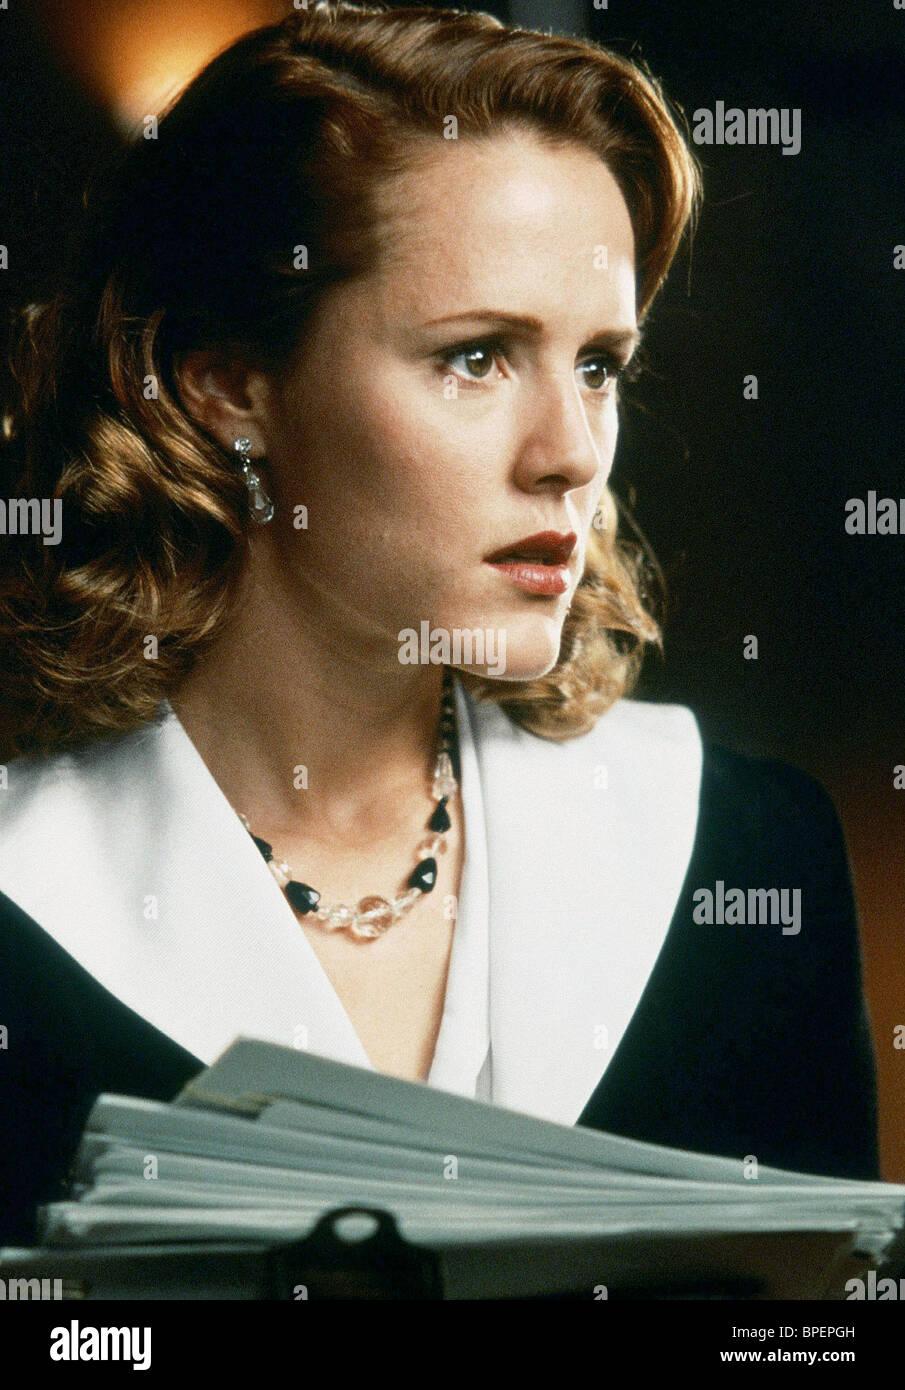 MARY STUART MASTERSON RADIOLAND MURDERS (1994) Stock Photo